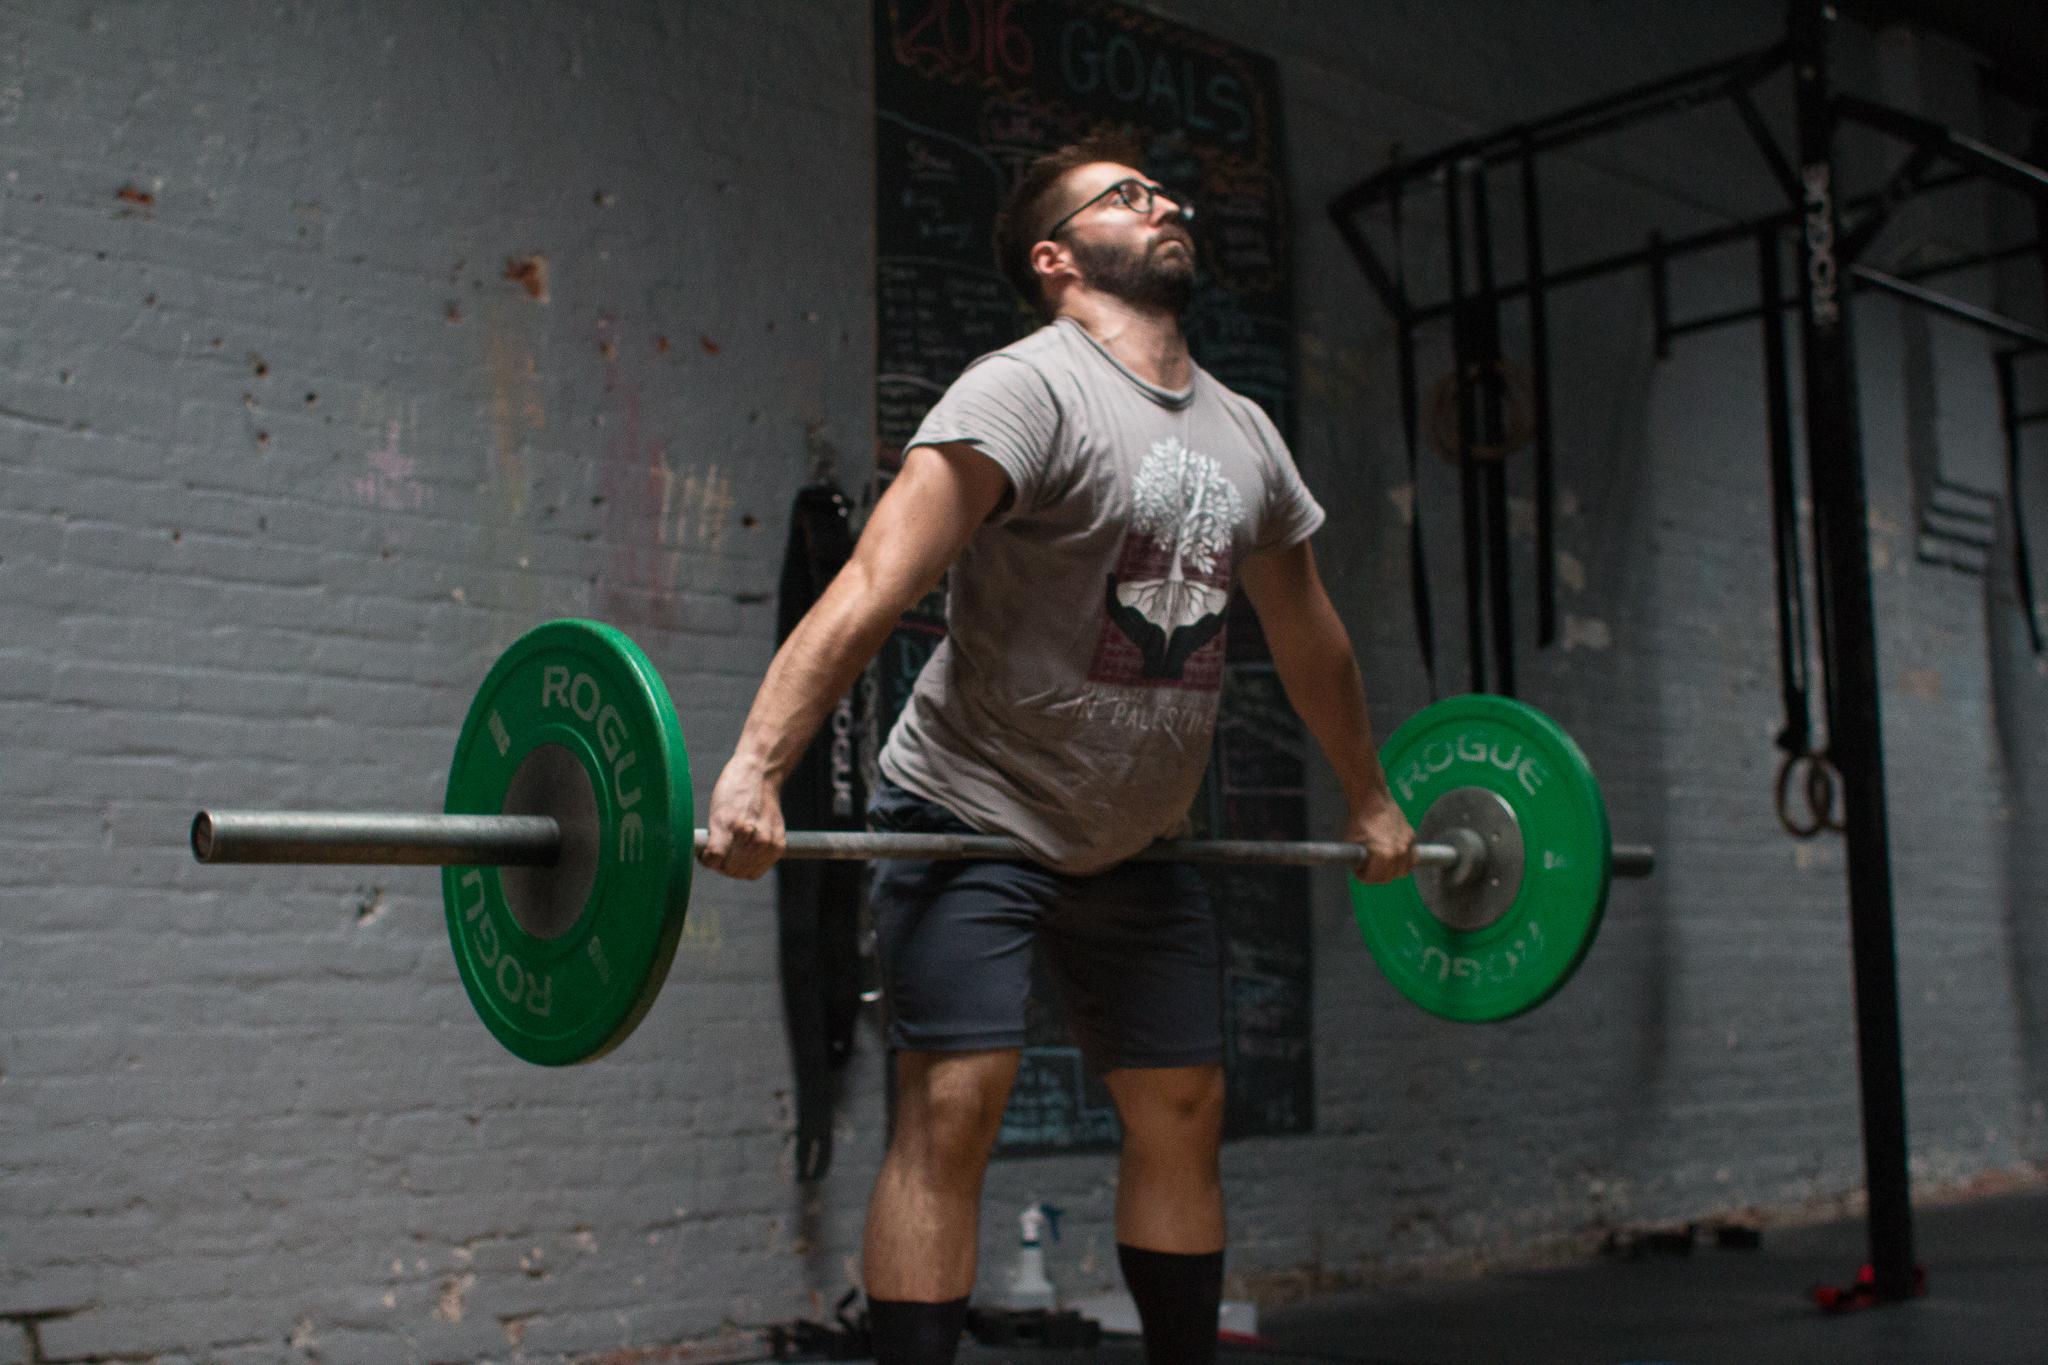 james-wright-visit-brooklyn-new-york-weightlifting-coach-teammates-october-2016 (45 of 92).jpg